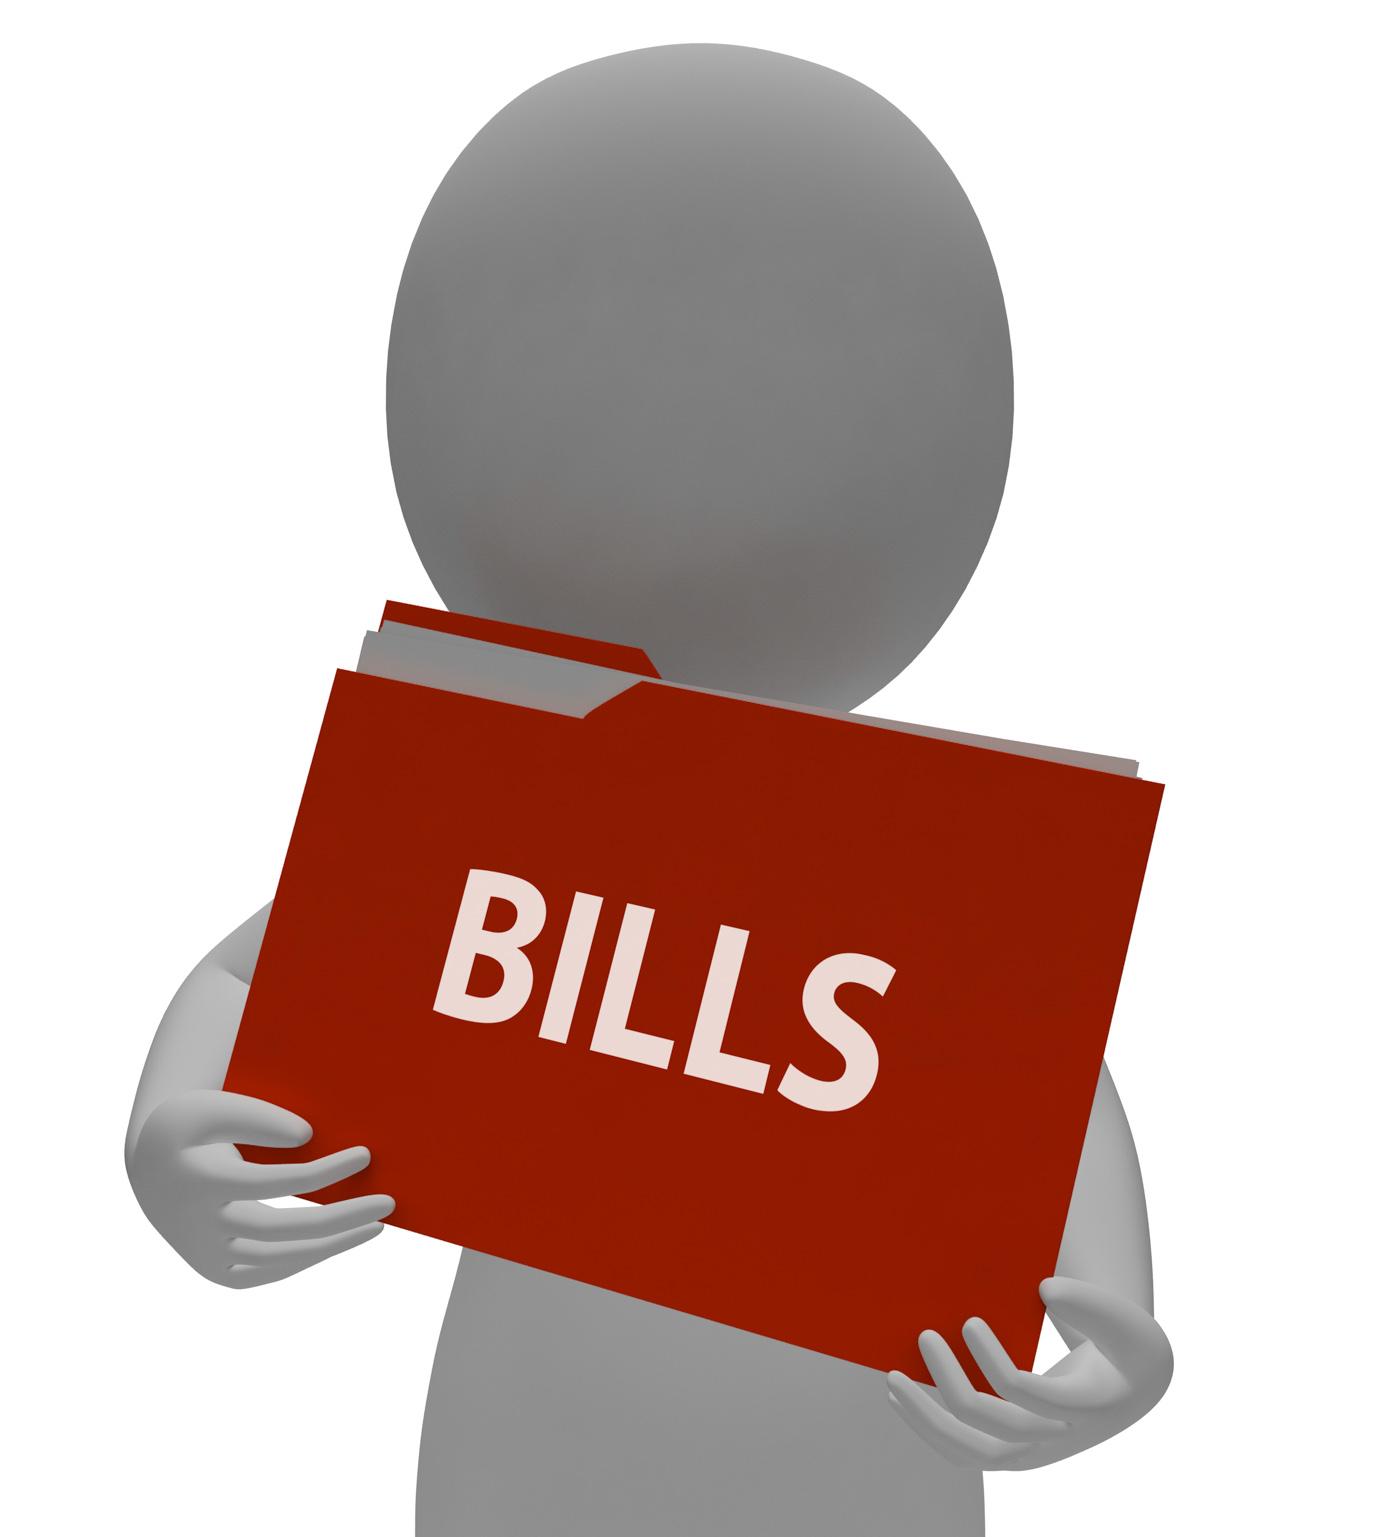 Bills Folder Means Binder Correspondence 3d Rendering, Finance, Payable, OtherKeywords, Invoices, HQ Photo